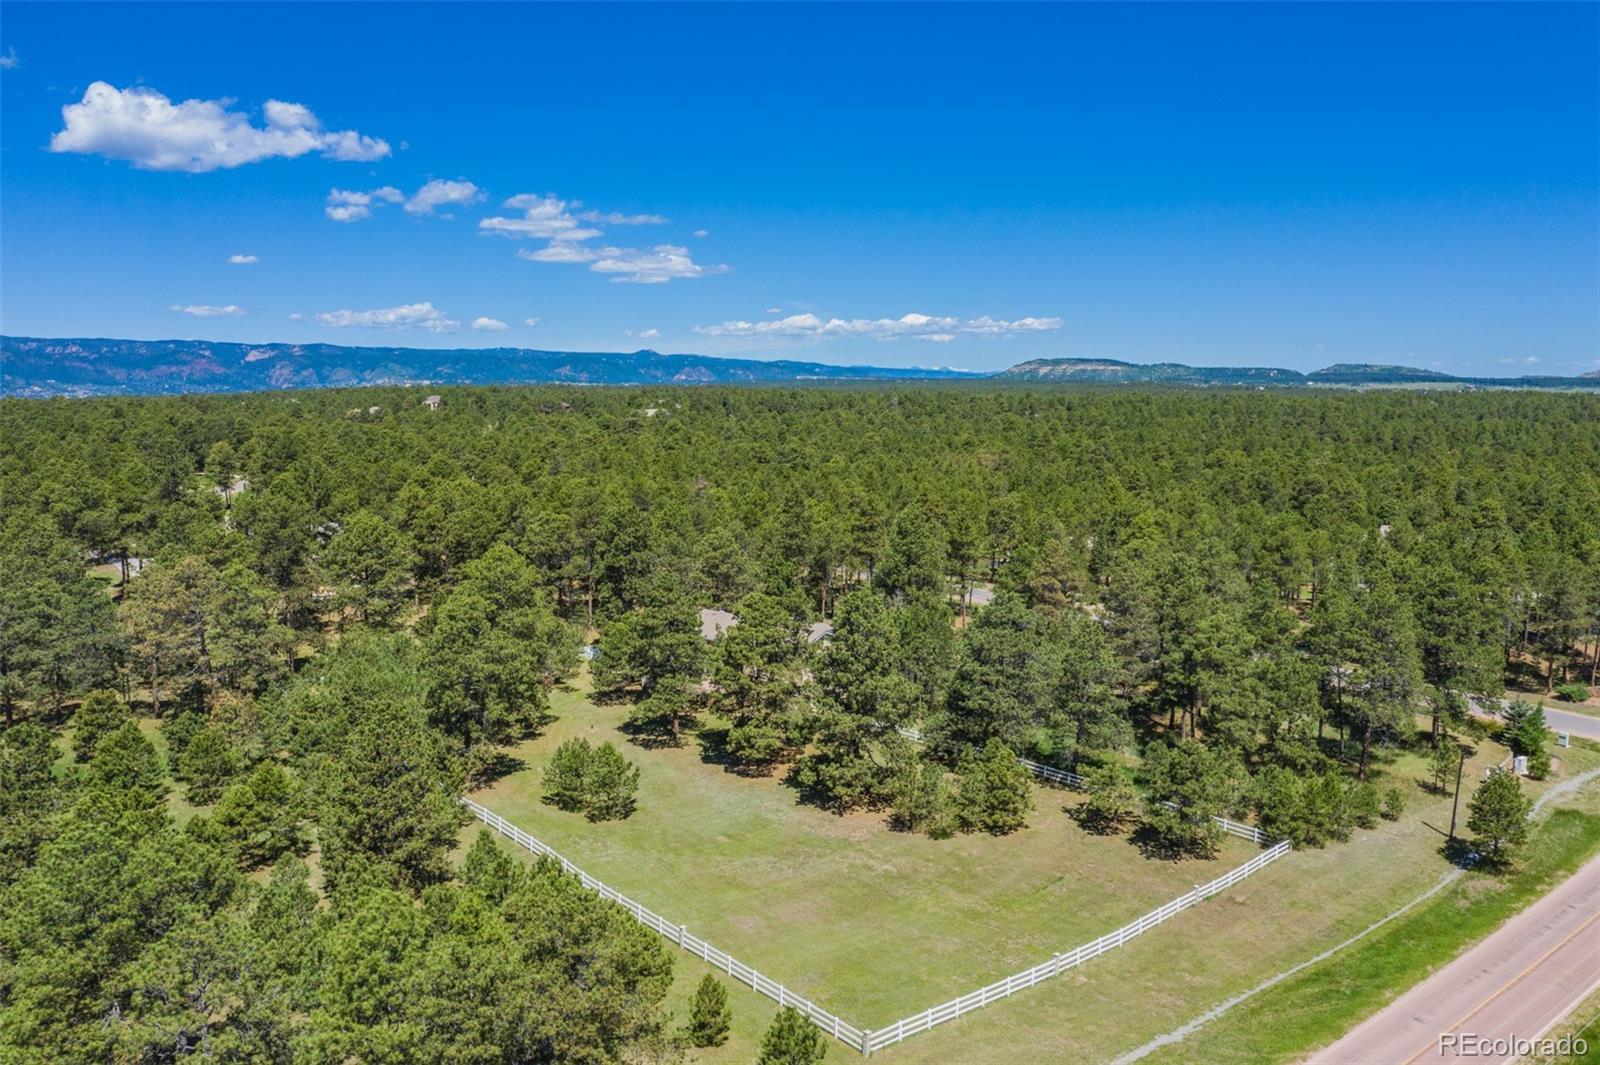 MLS# 2707350 - 4 - 17310 Charter Pines , Colorado Springs, CO 80132